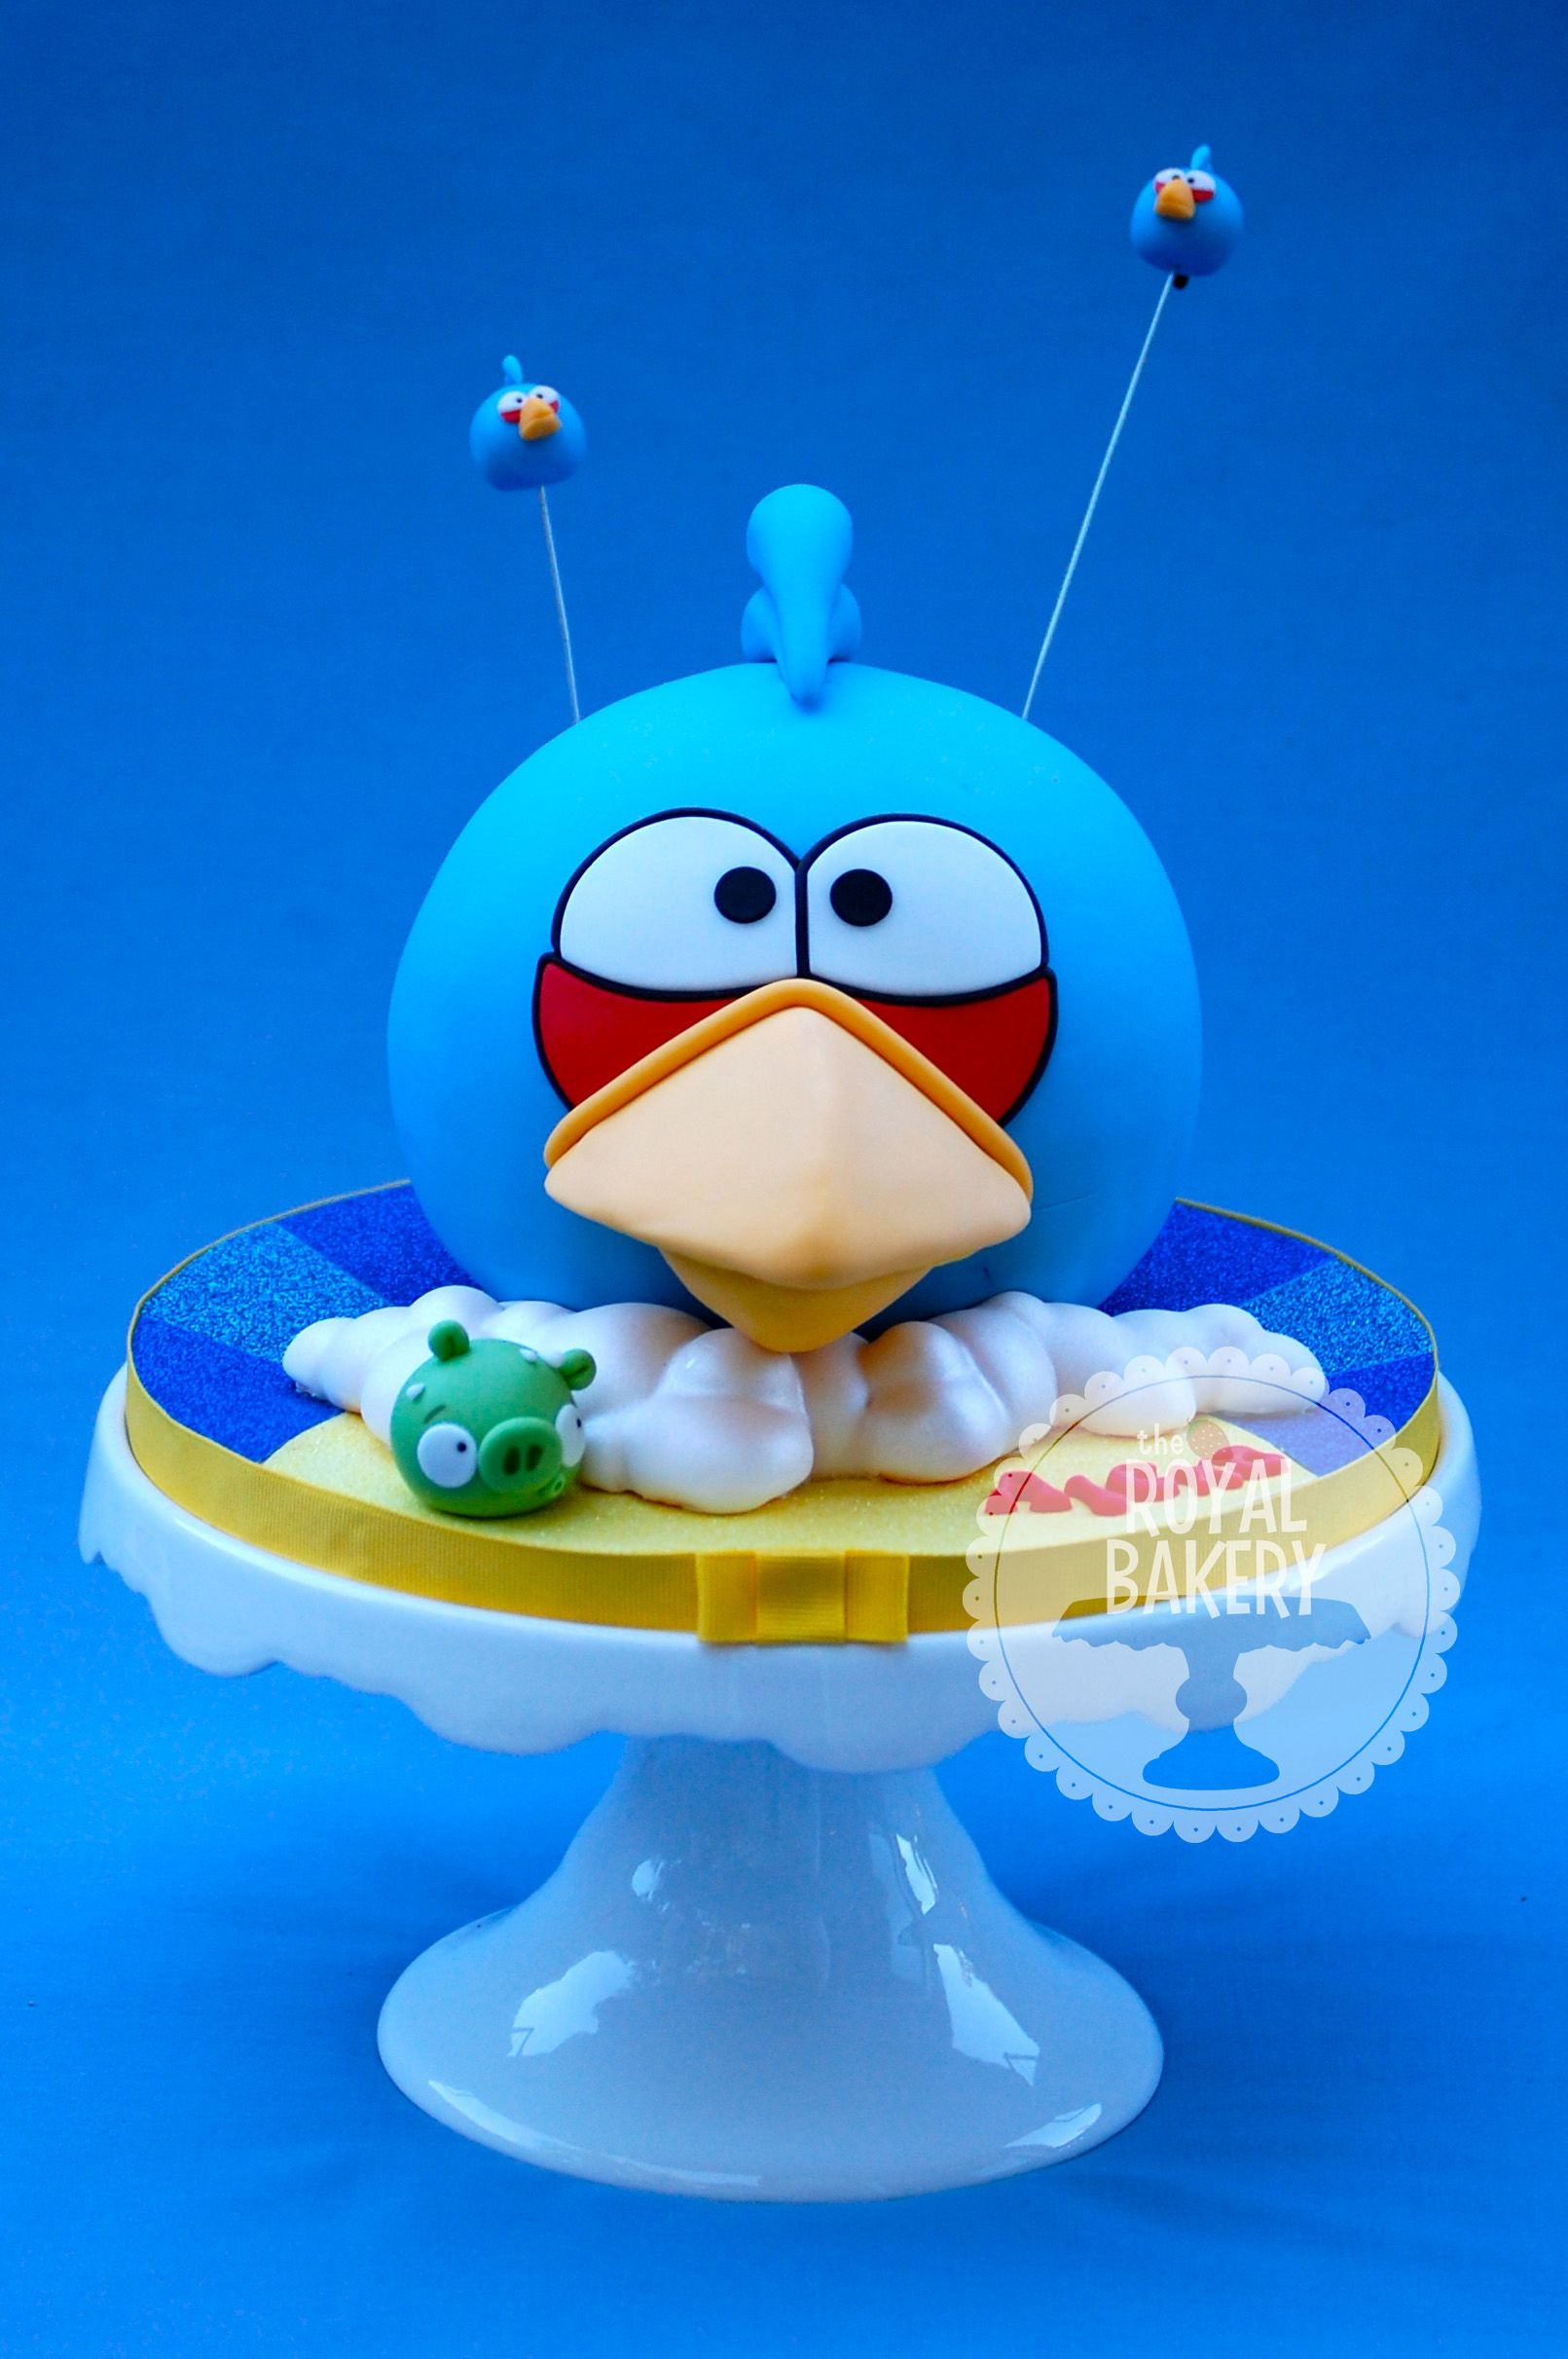 The Royal Bakery - Blue Angry Bird Cake